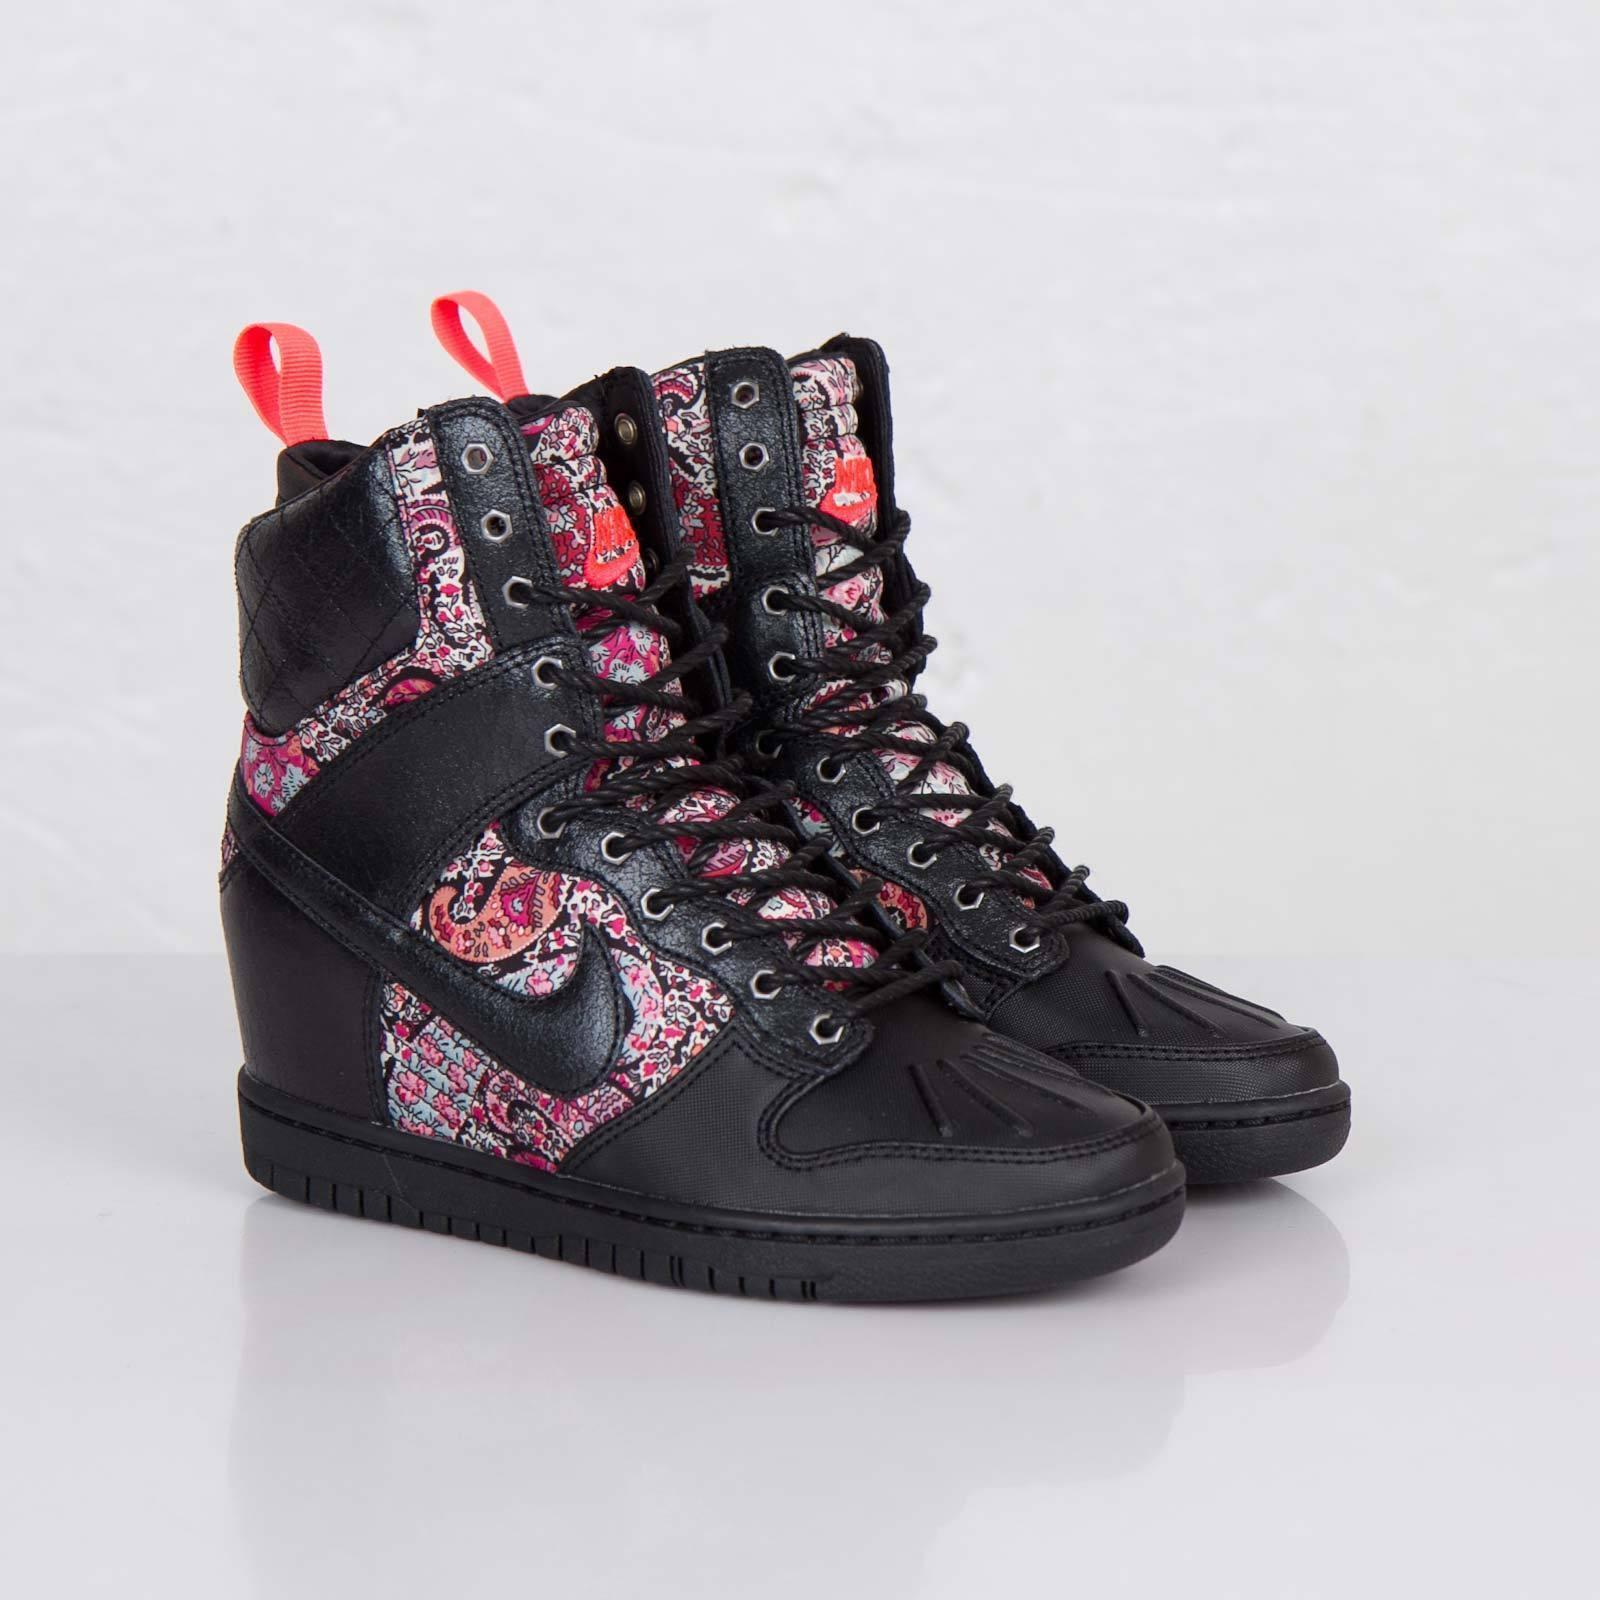 Nike WOMEN'S Dunk SKY HI HIGH HIDDEN WEDGE Sneakerboot LIBERTY QS SIZE 5 NEW